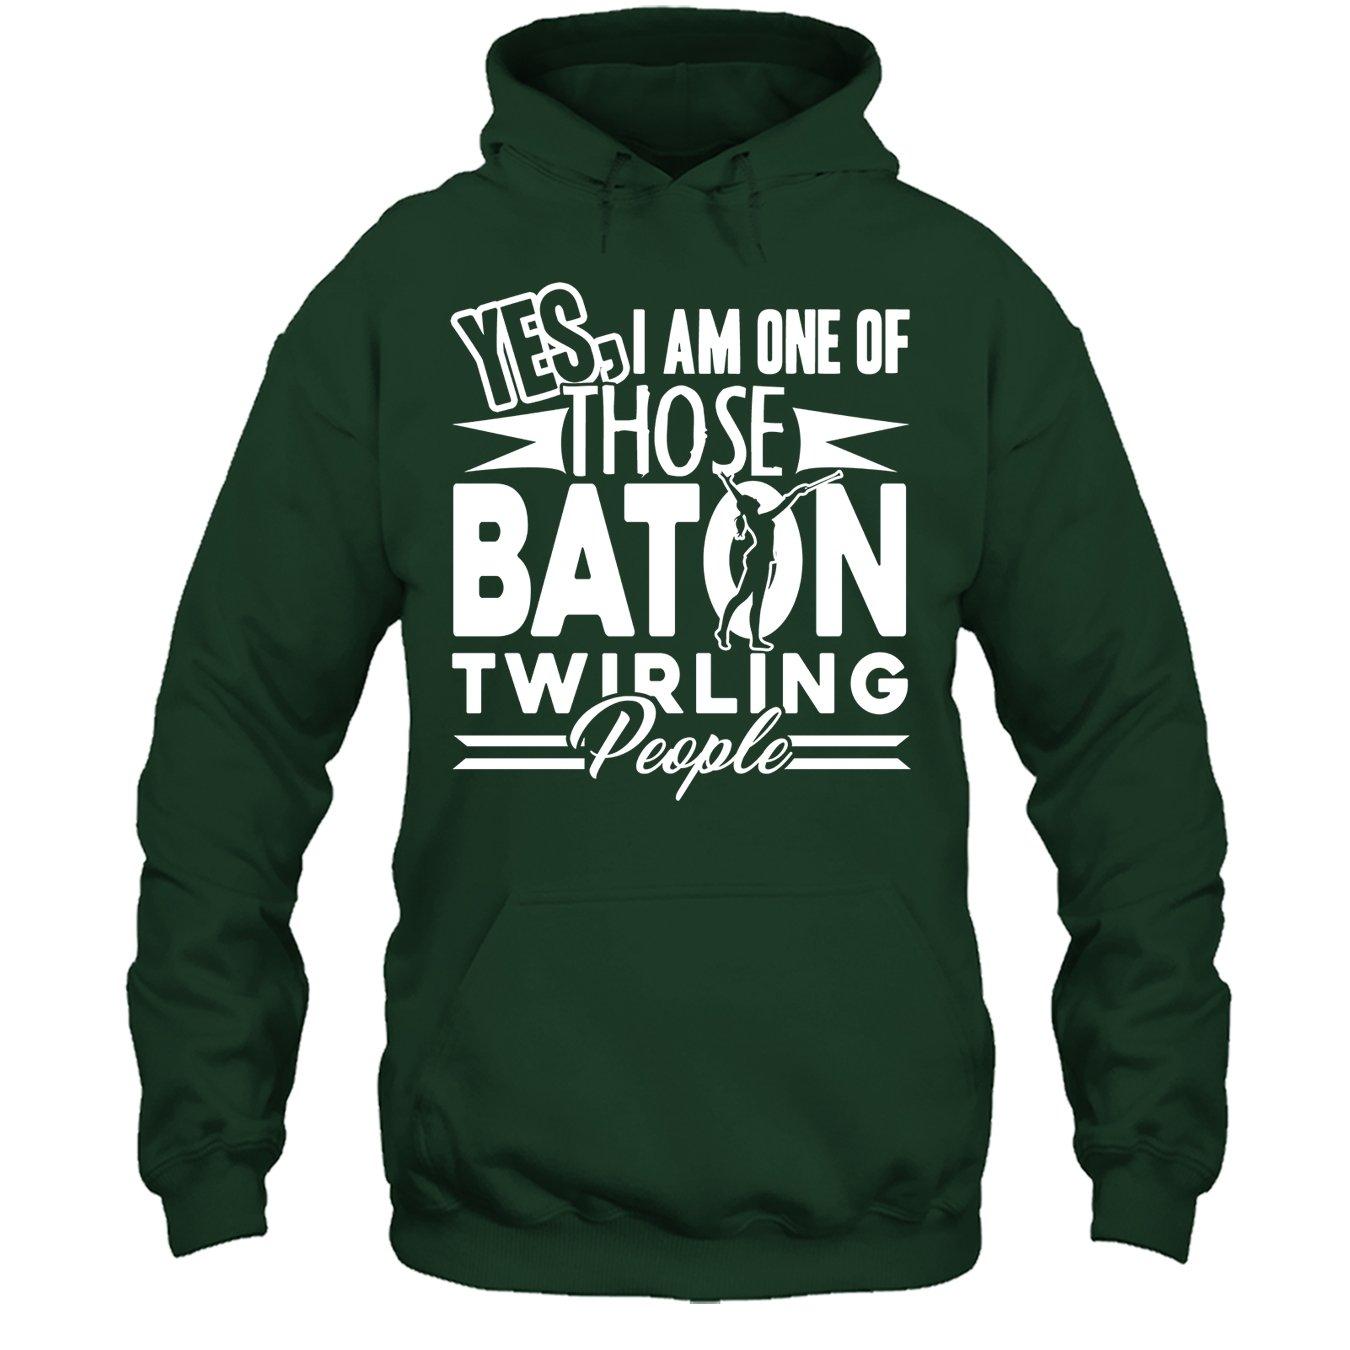 Baton Twirling Tee Shirt I Am One of Those Baton Twirling People T Shirt